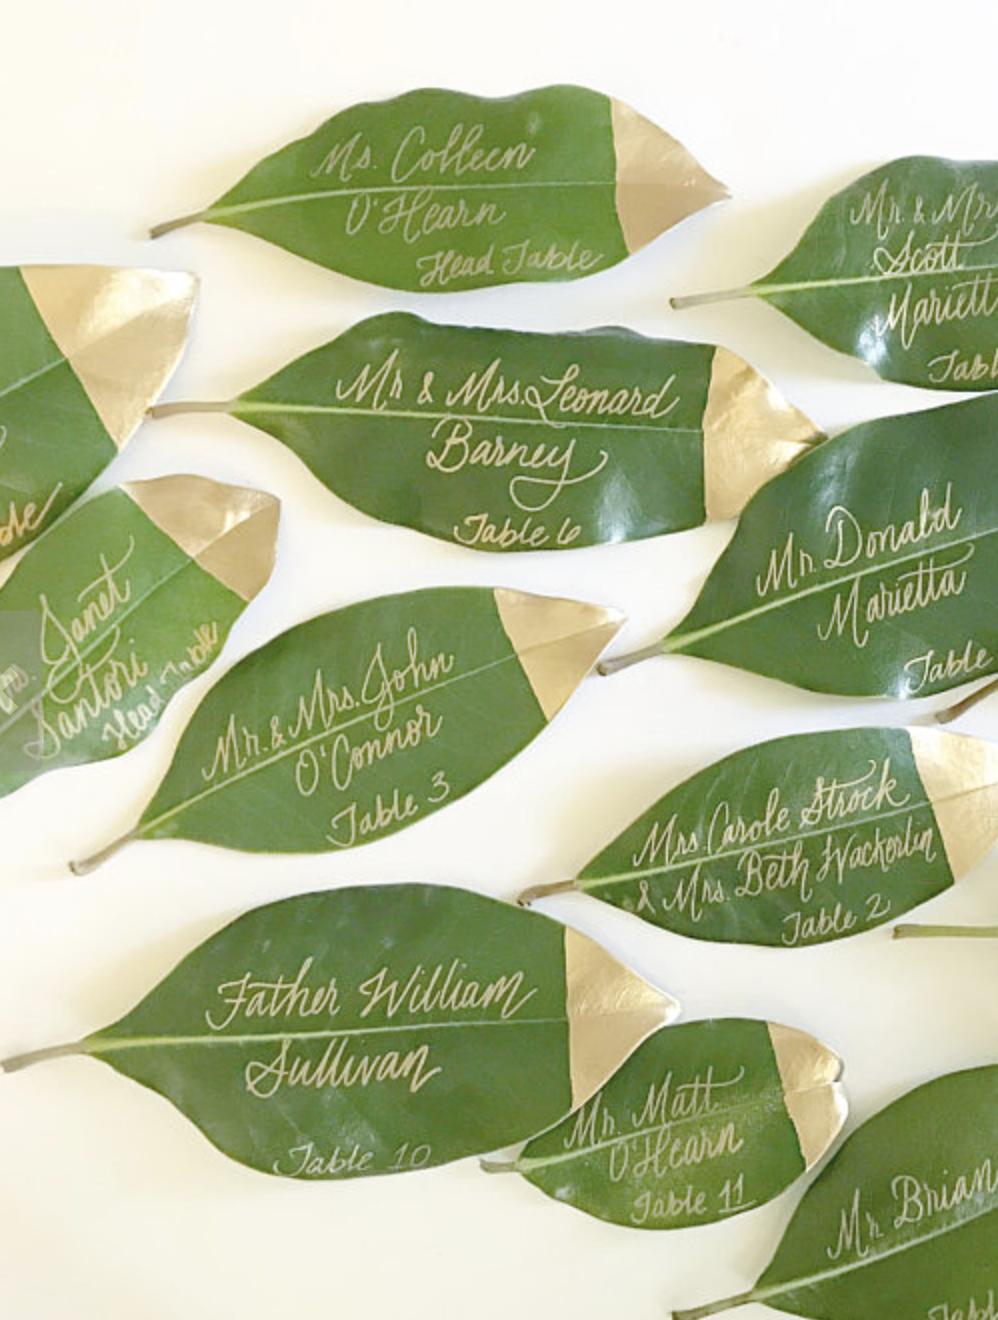 Magnolia leaf place card